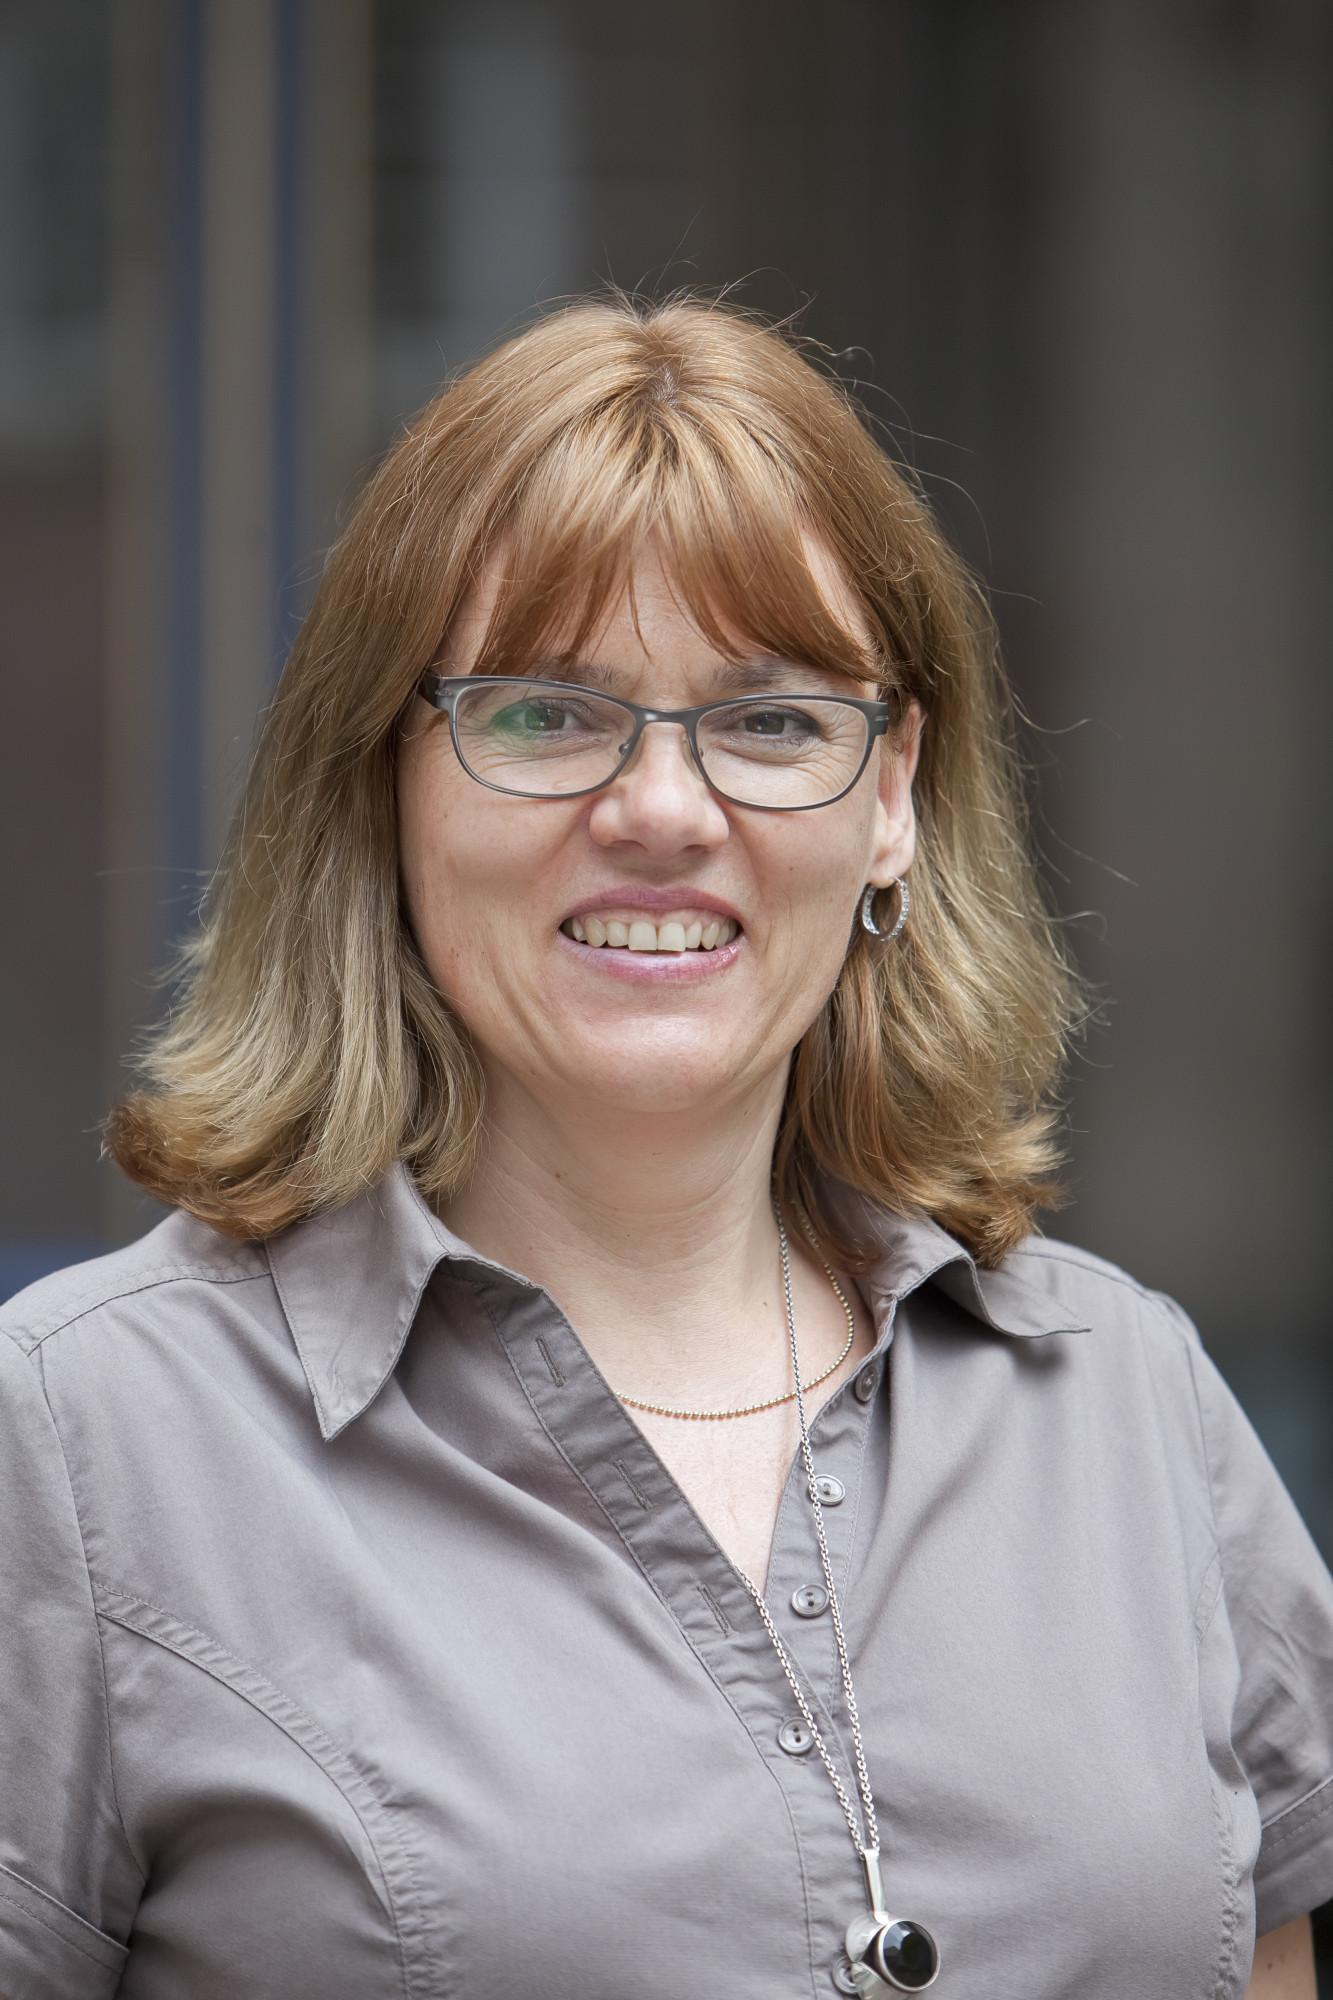 Ursula Straetz